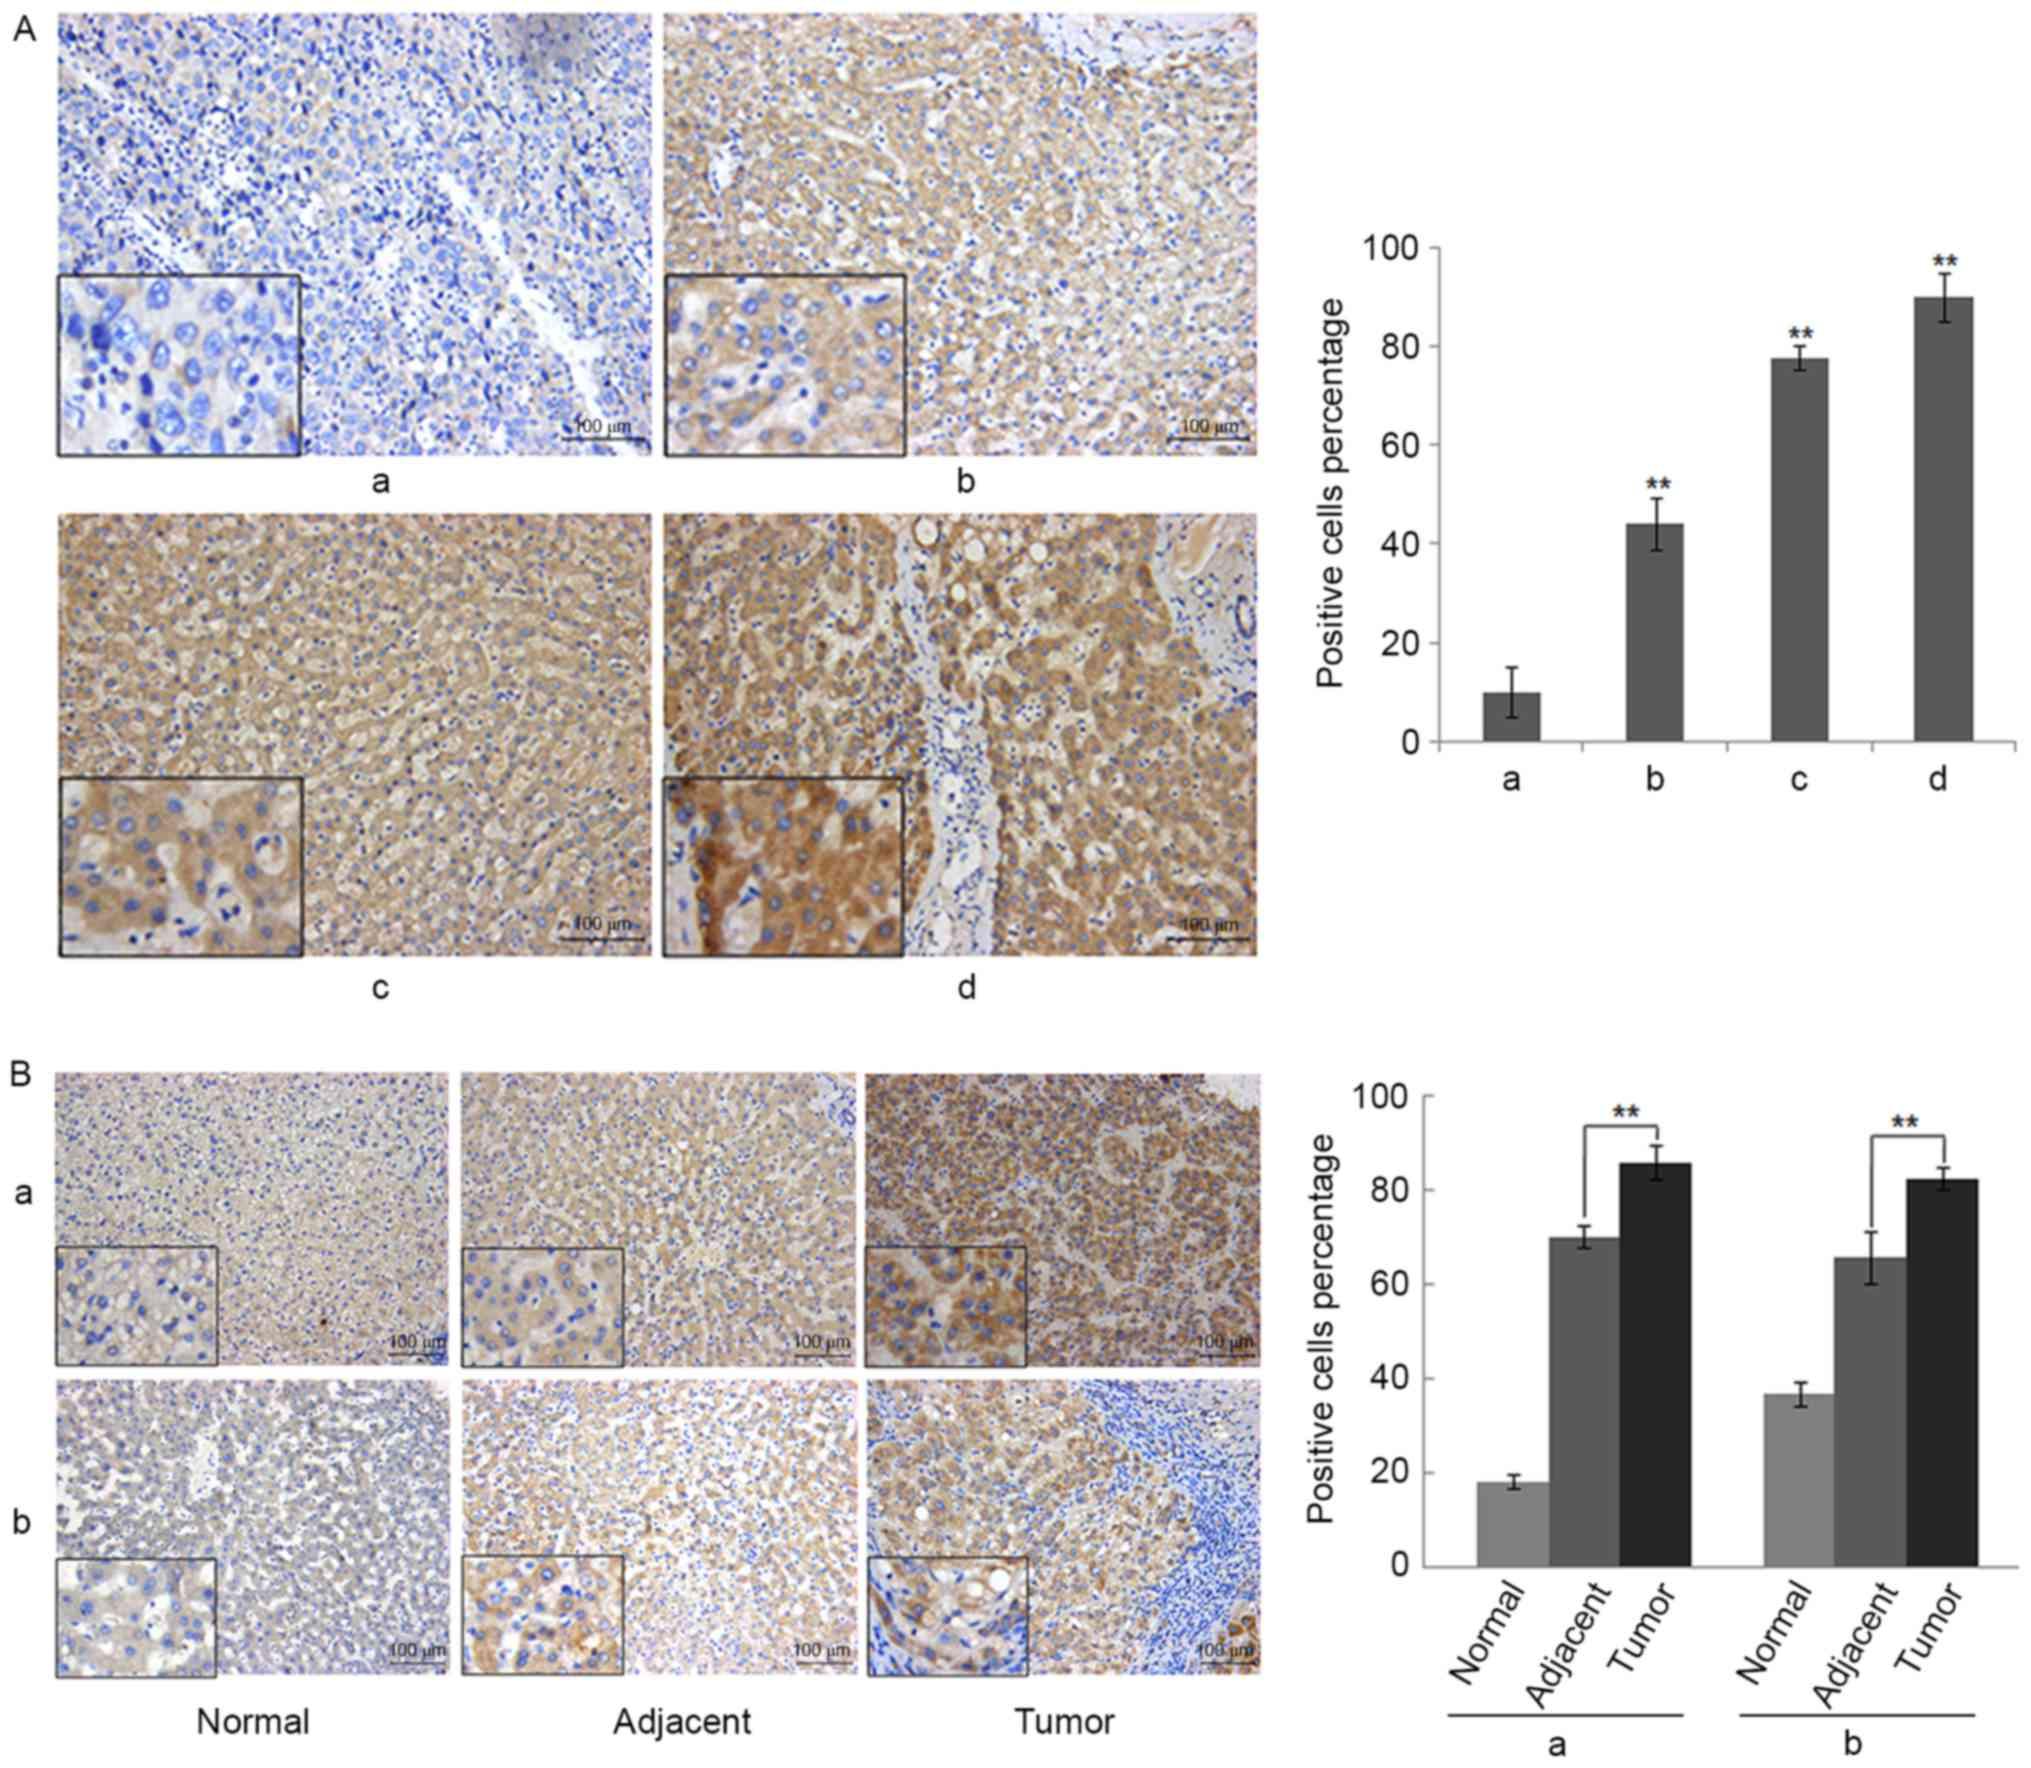 R-spondin 2 promotes proliferation and migration via the Wnt/β